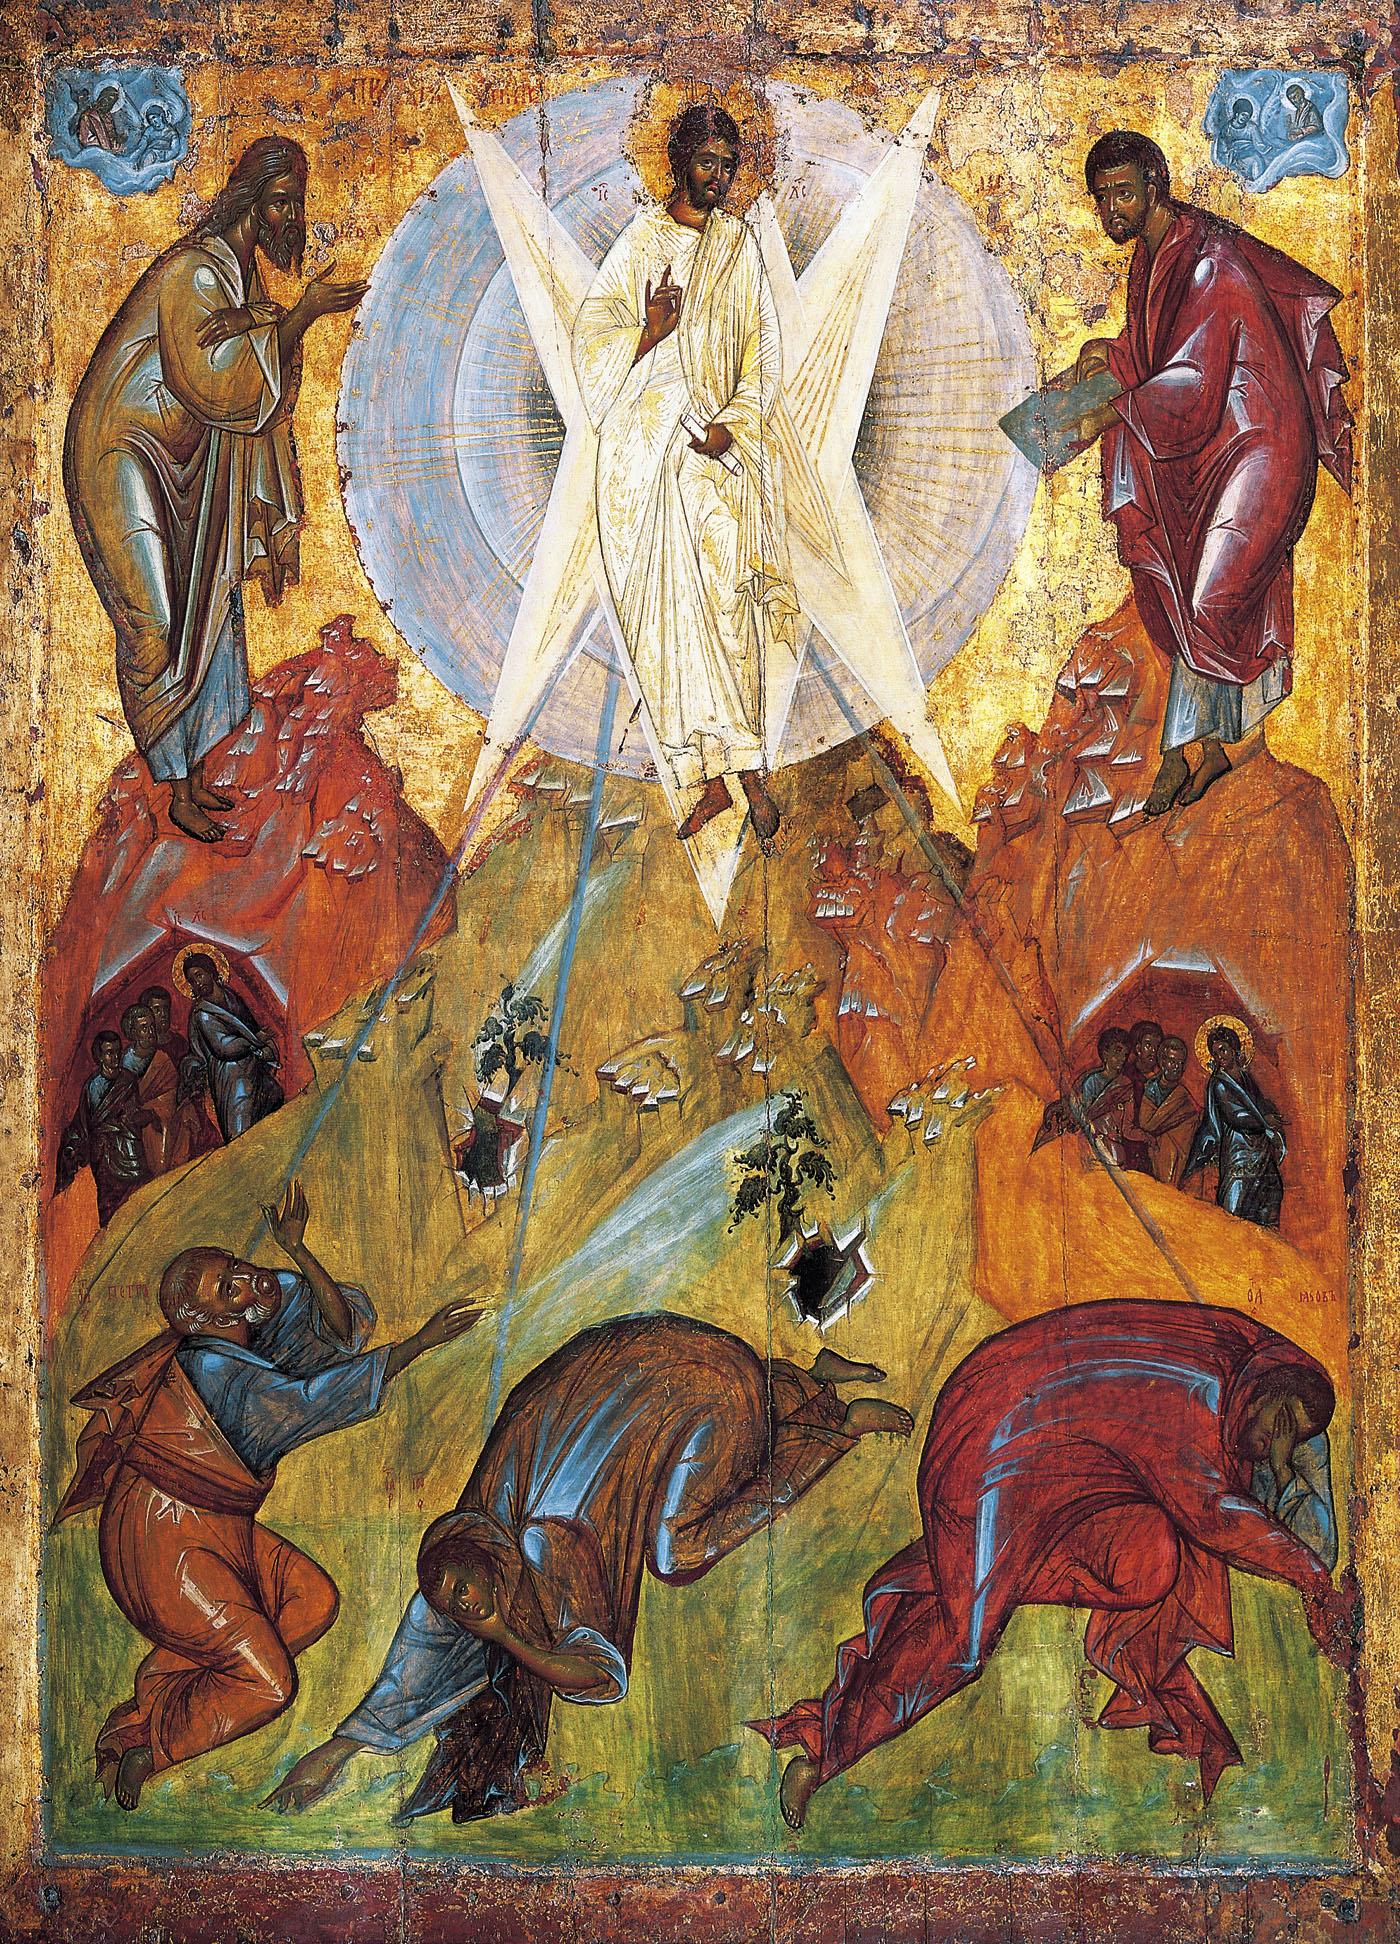 Transfiguration_by_Feofan_Grek_from_Spaso-Preobrazhensky_Cathedral_in_Pereslavl-Zalessky_(15th_c,_Tretyakov_gallery).jpg